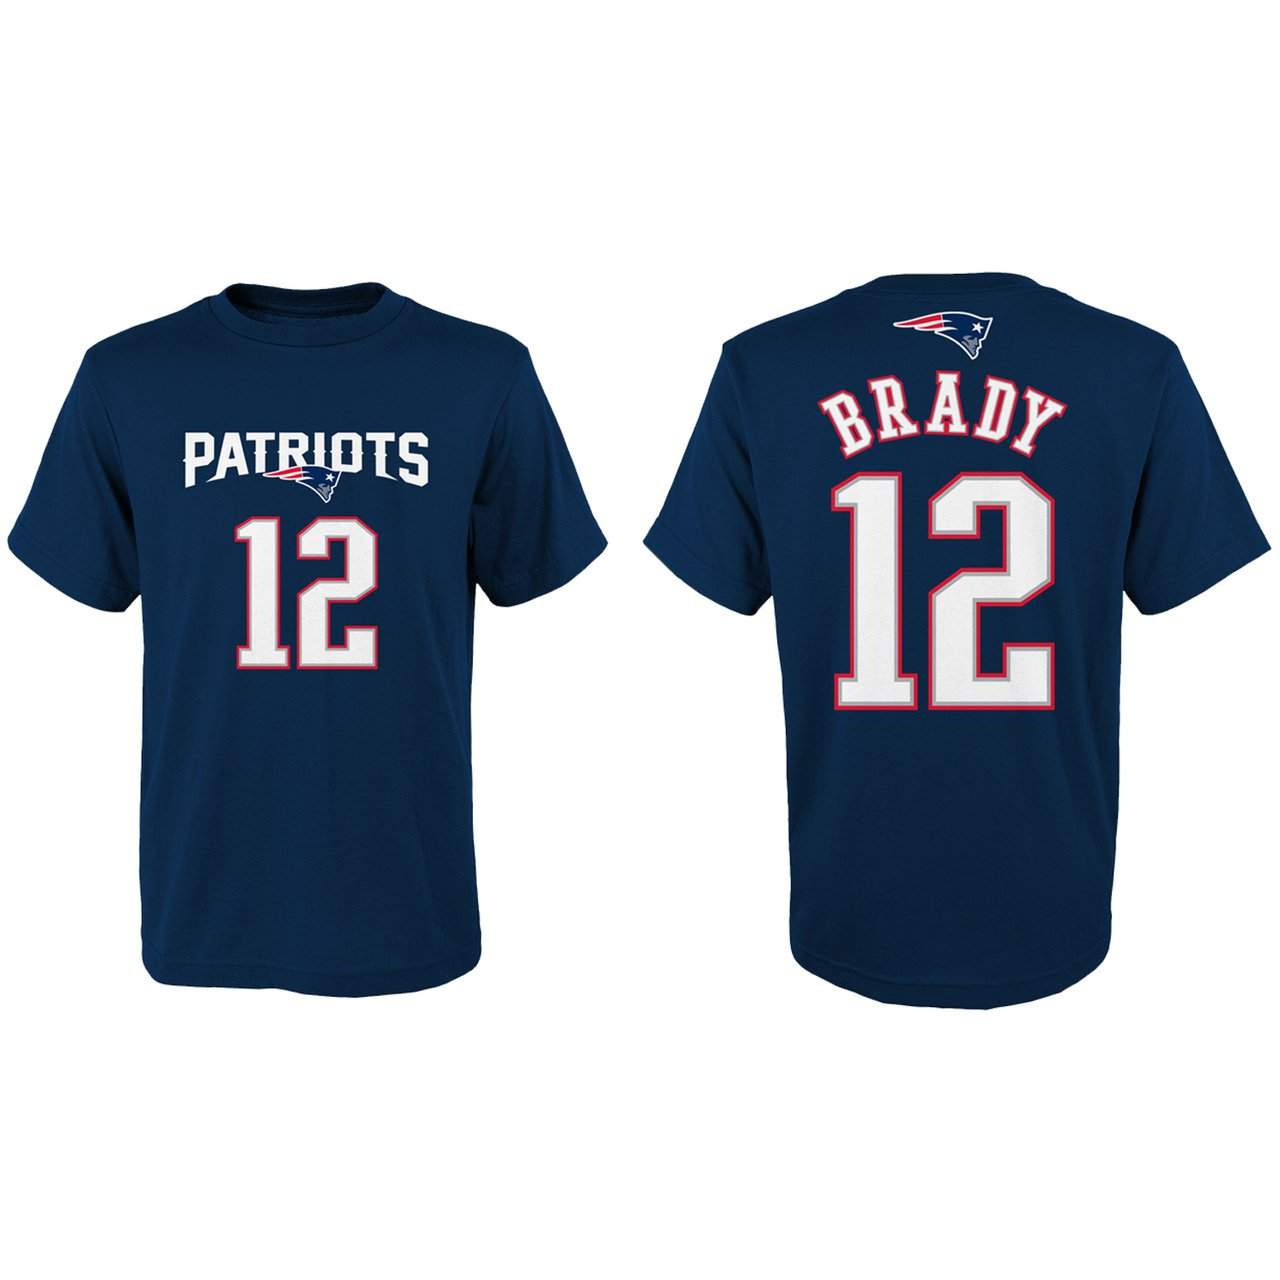 1e64012f Amazon.com : Outerstuff Tom Brady New England Patriots Youth ...